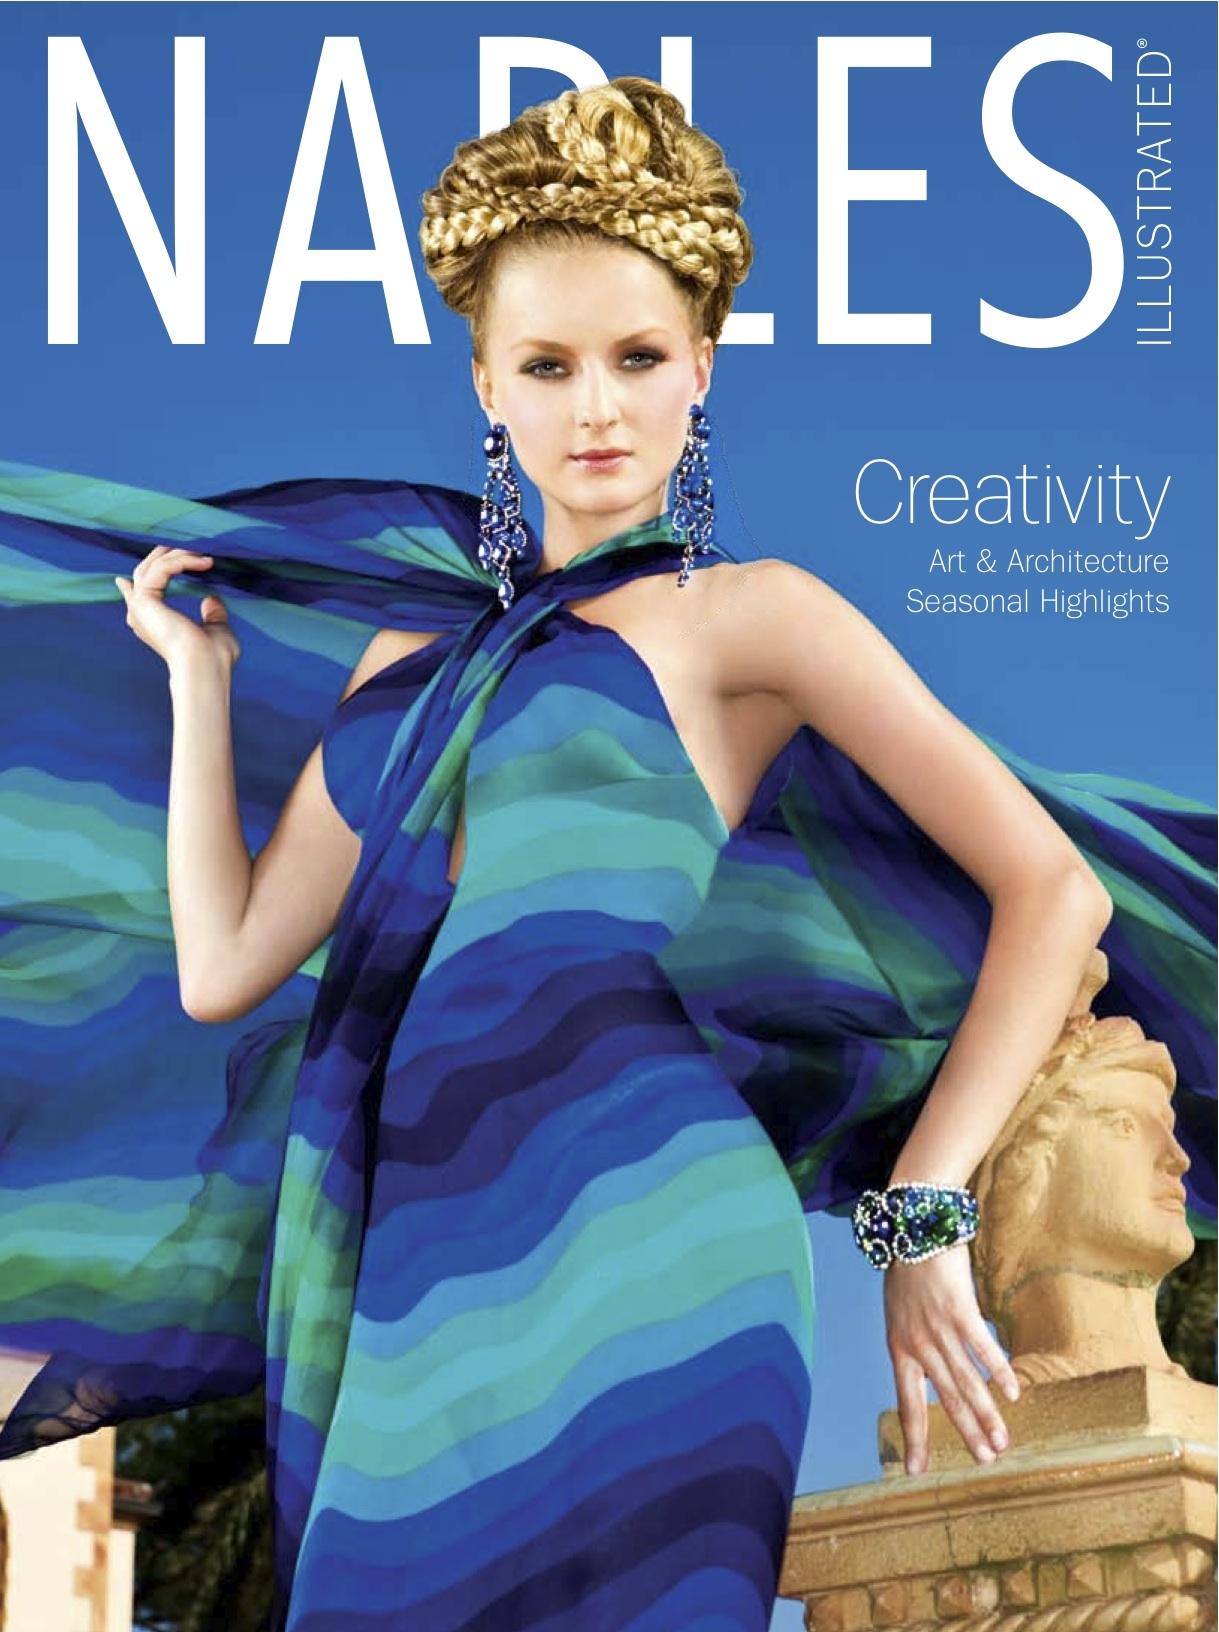 Naples Illustrated June 2009